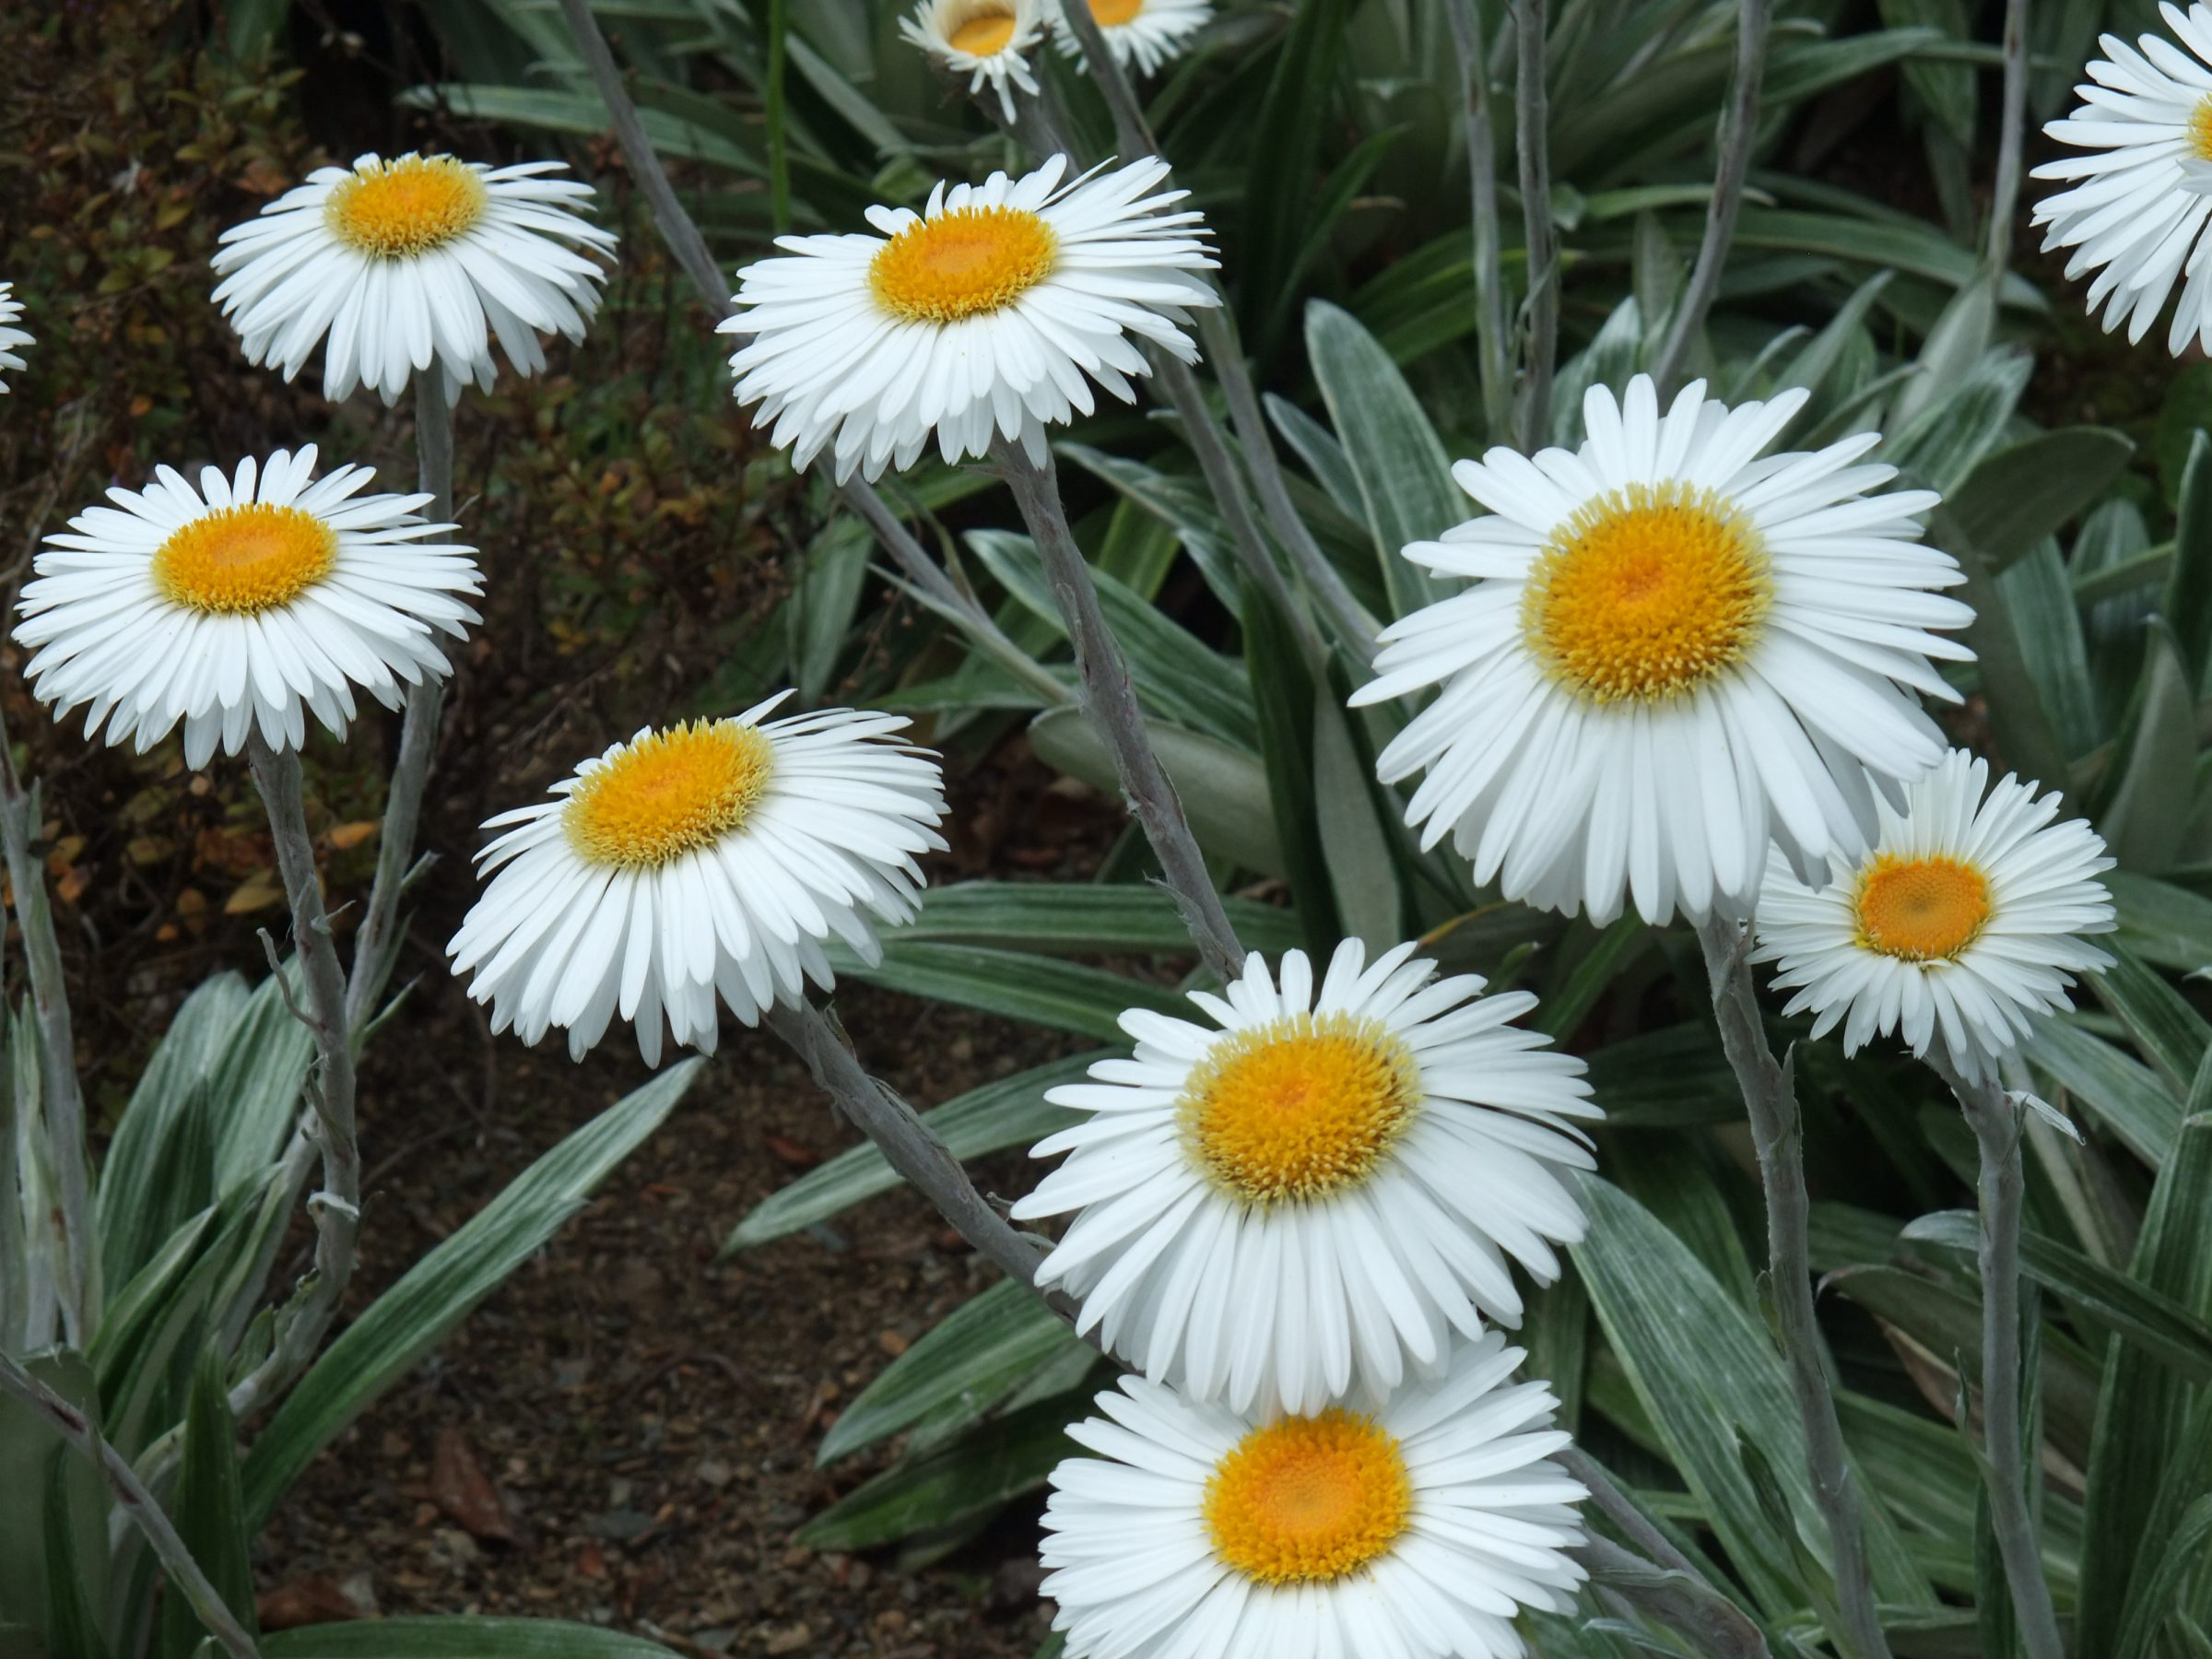 Giant daisy (Celmesias)